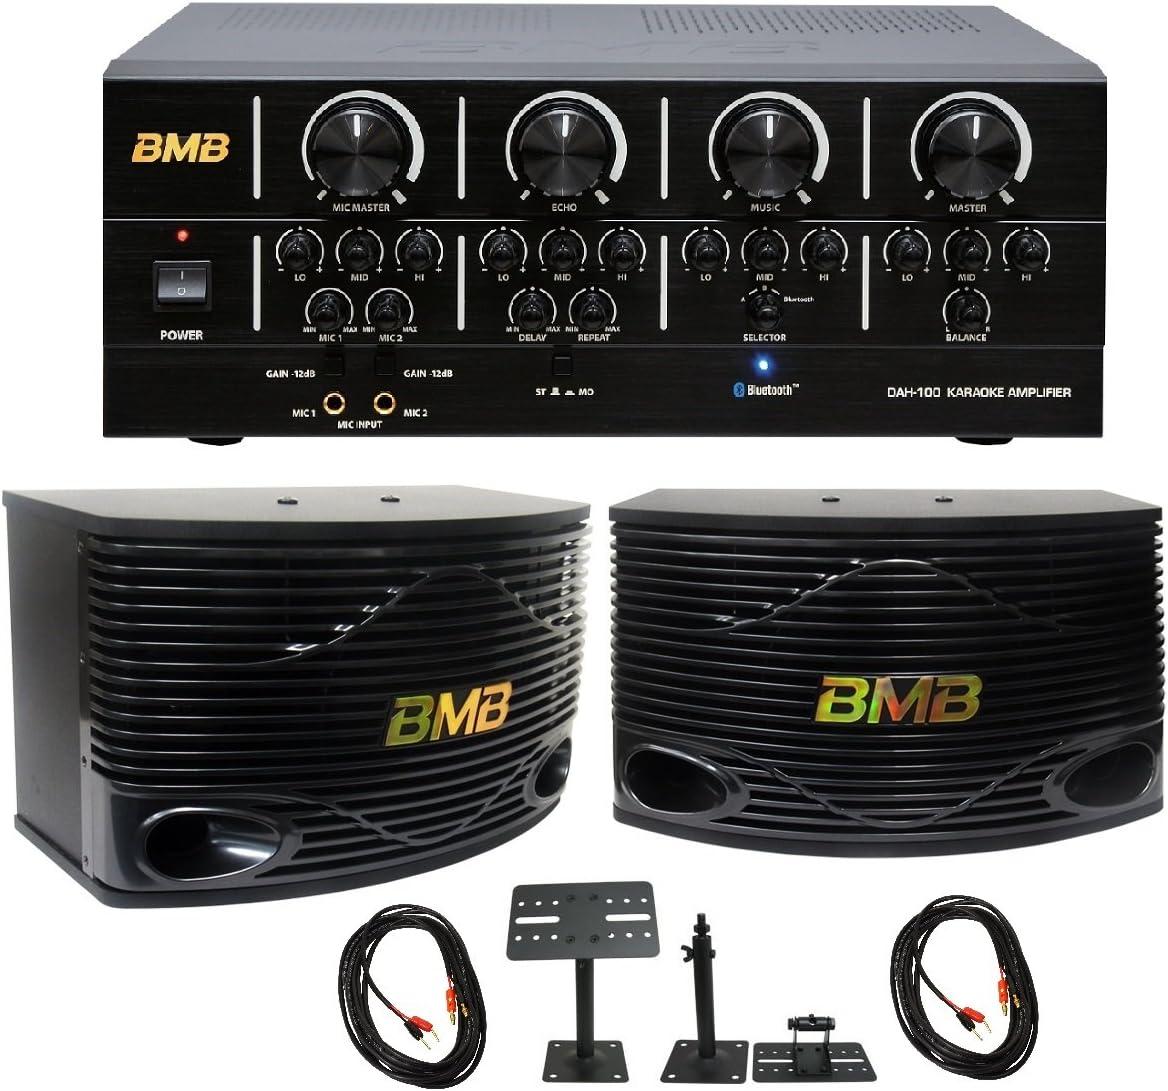 Pair Pair Package w//Speaker Mount Speaker Cable OFC and 15ft Pin to Banana Plugs Pair BMB DAH-100 200W Amplifier /& BMB CSN-300 8 3-Way Karaoke Speaker